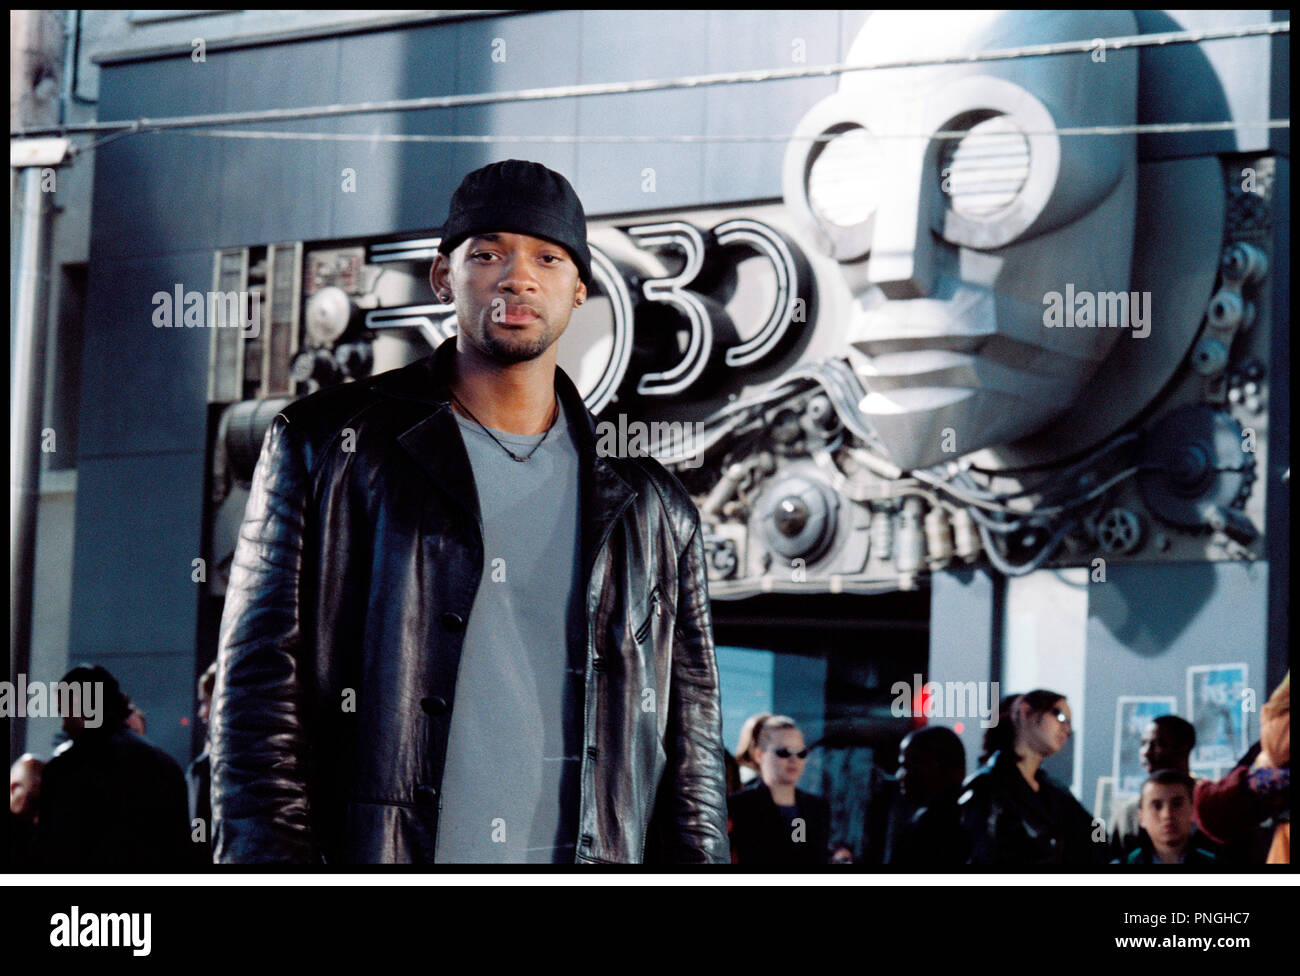 Prod DB © 20th Century Fox - Overbrook Entertainment / DR I, ROBOT (I ROBOT) de Alex Proyas 2004 USA avec Will Smith  inspire du livre de Isaac Asimov  veste en cuir, bonnet,  futuriste, science fiction - Stock Image